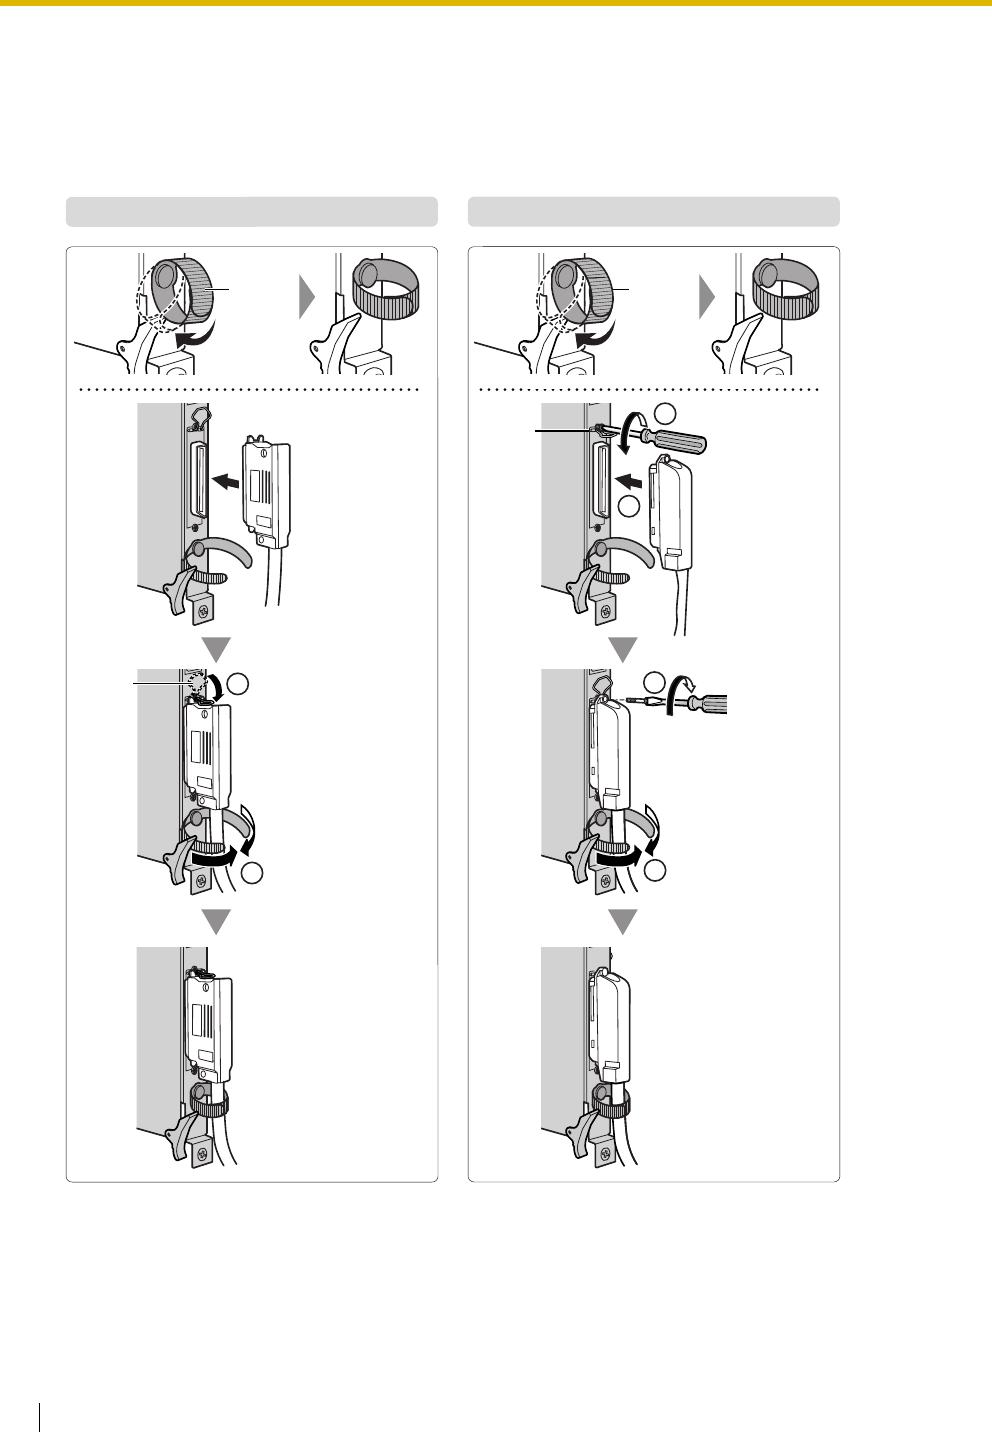 Panasonic KX-TDA100 2.2.10 Fastening Amphenol Connector